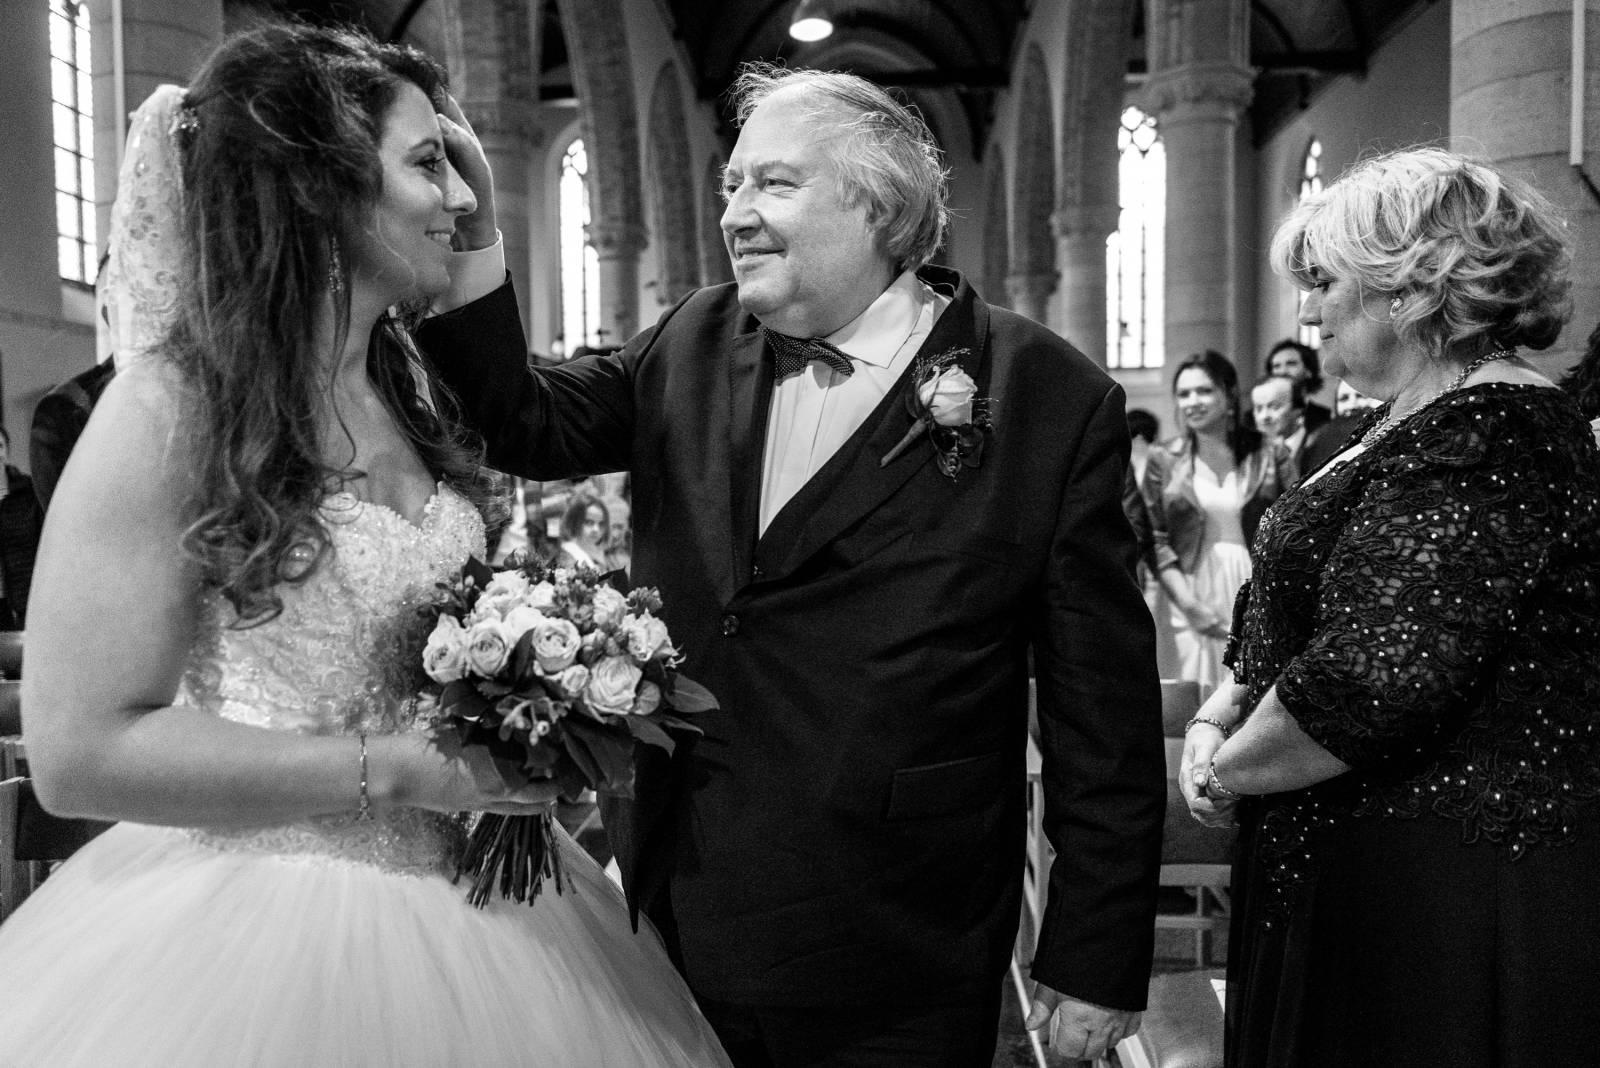 LOGO Fotografie Melody - Huwelijksfotograaf - Trouwfotograaf - House of Weddings - 5